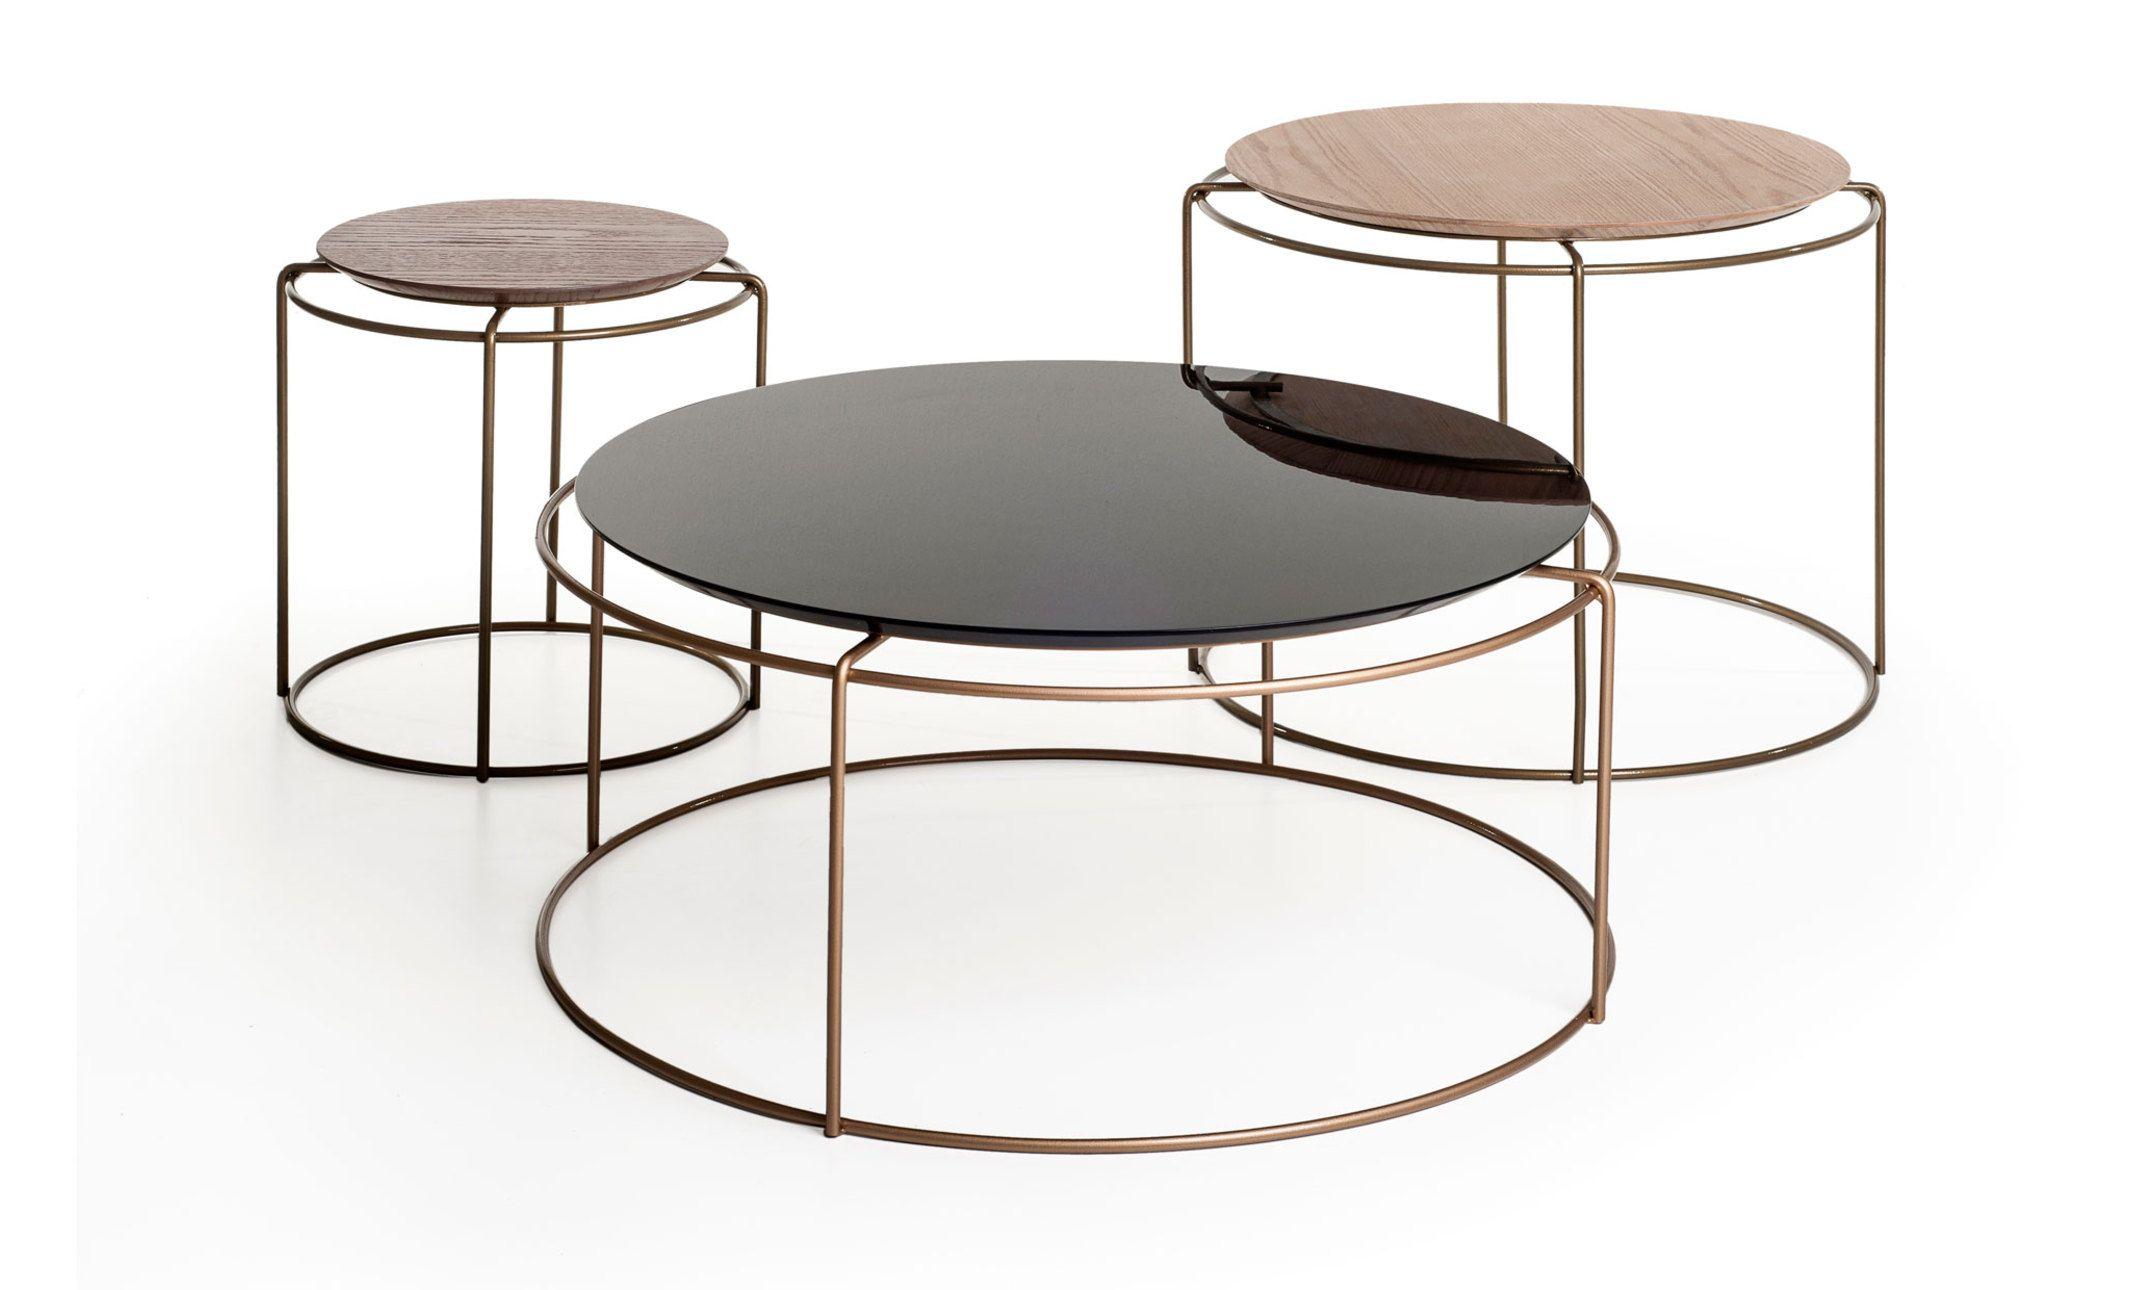 6d0dda54a2bdb8e0069941c0c3e6c7be Impressionnant De Table Gigogne Ikea Concept